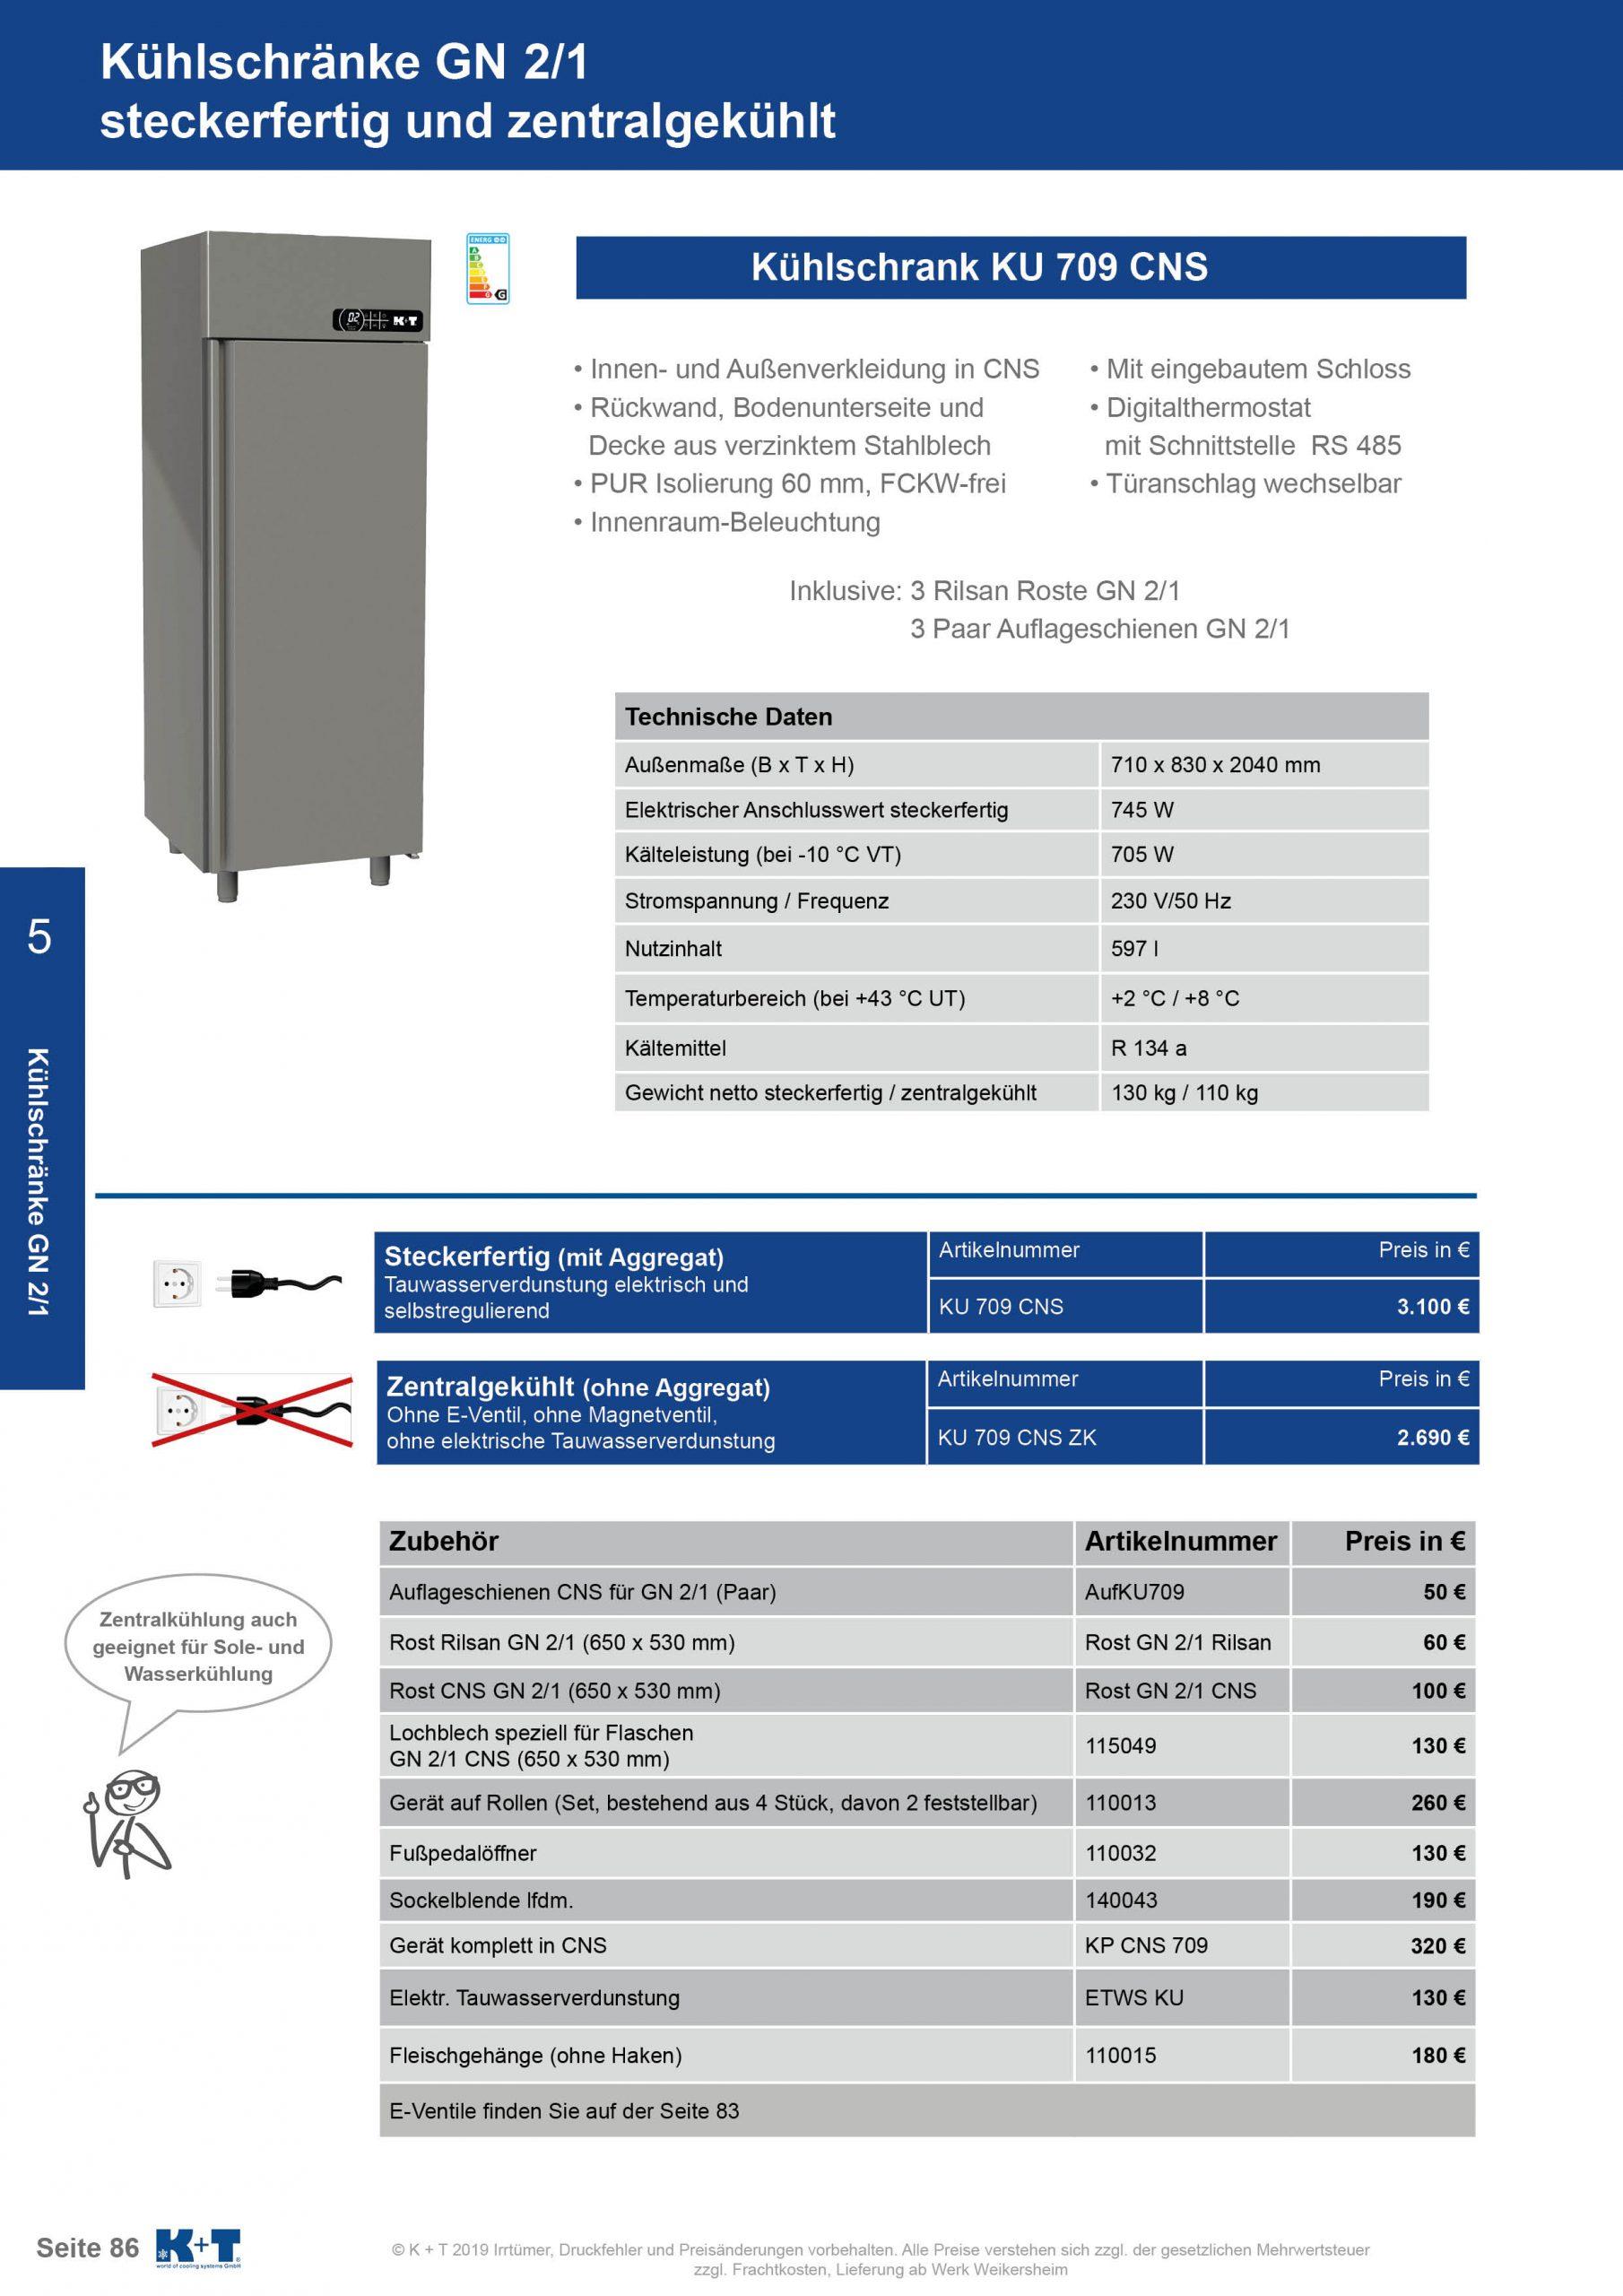 Kühlschränke GN 2_1 Kühlschrank steckerfertig